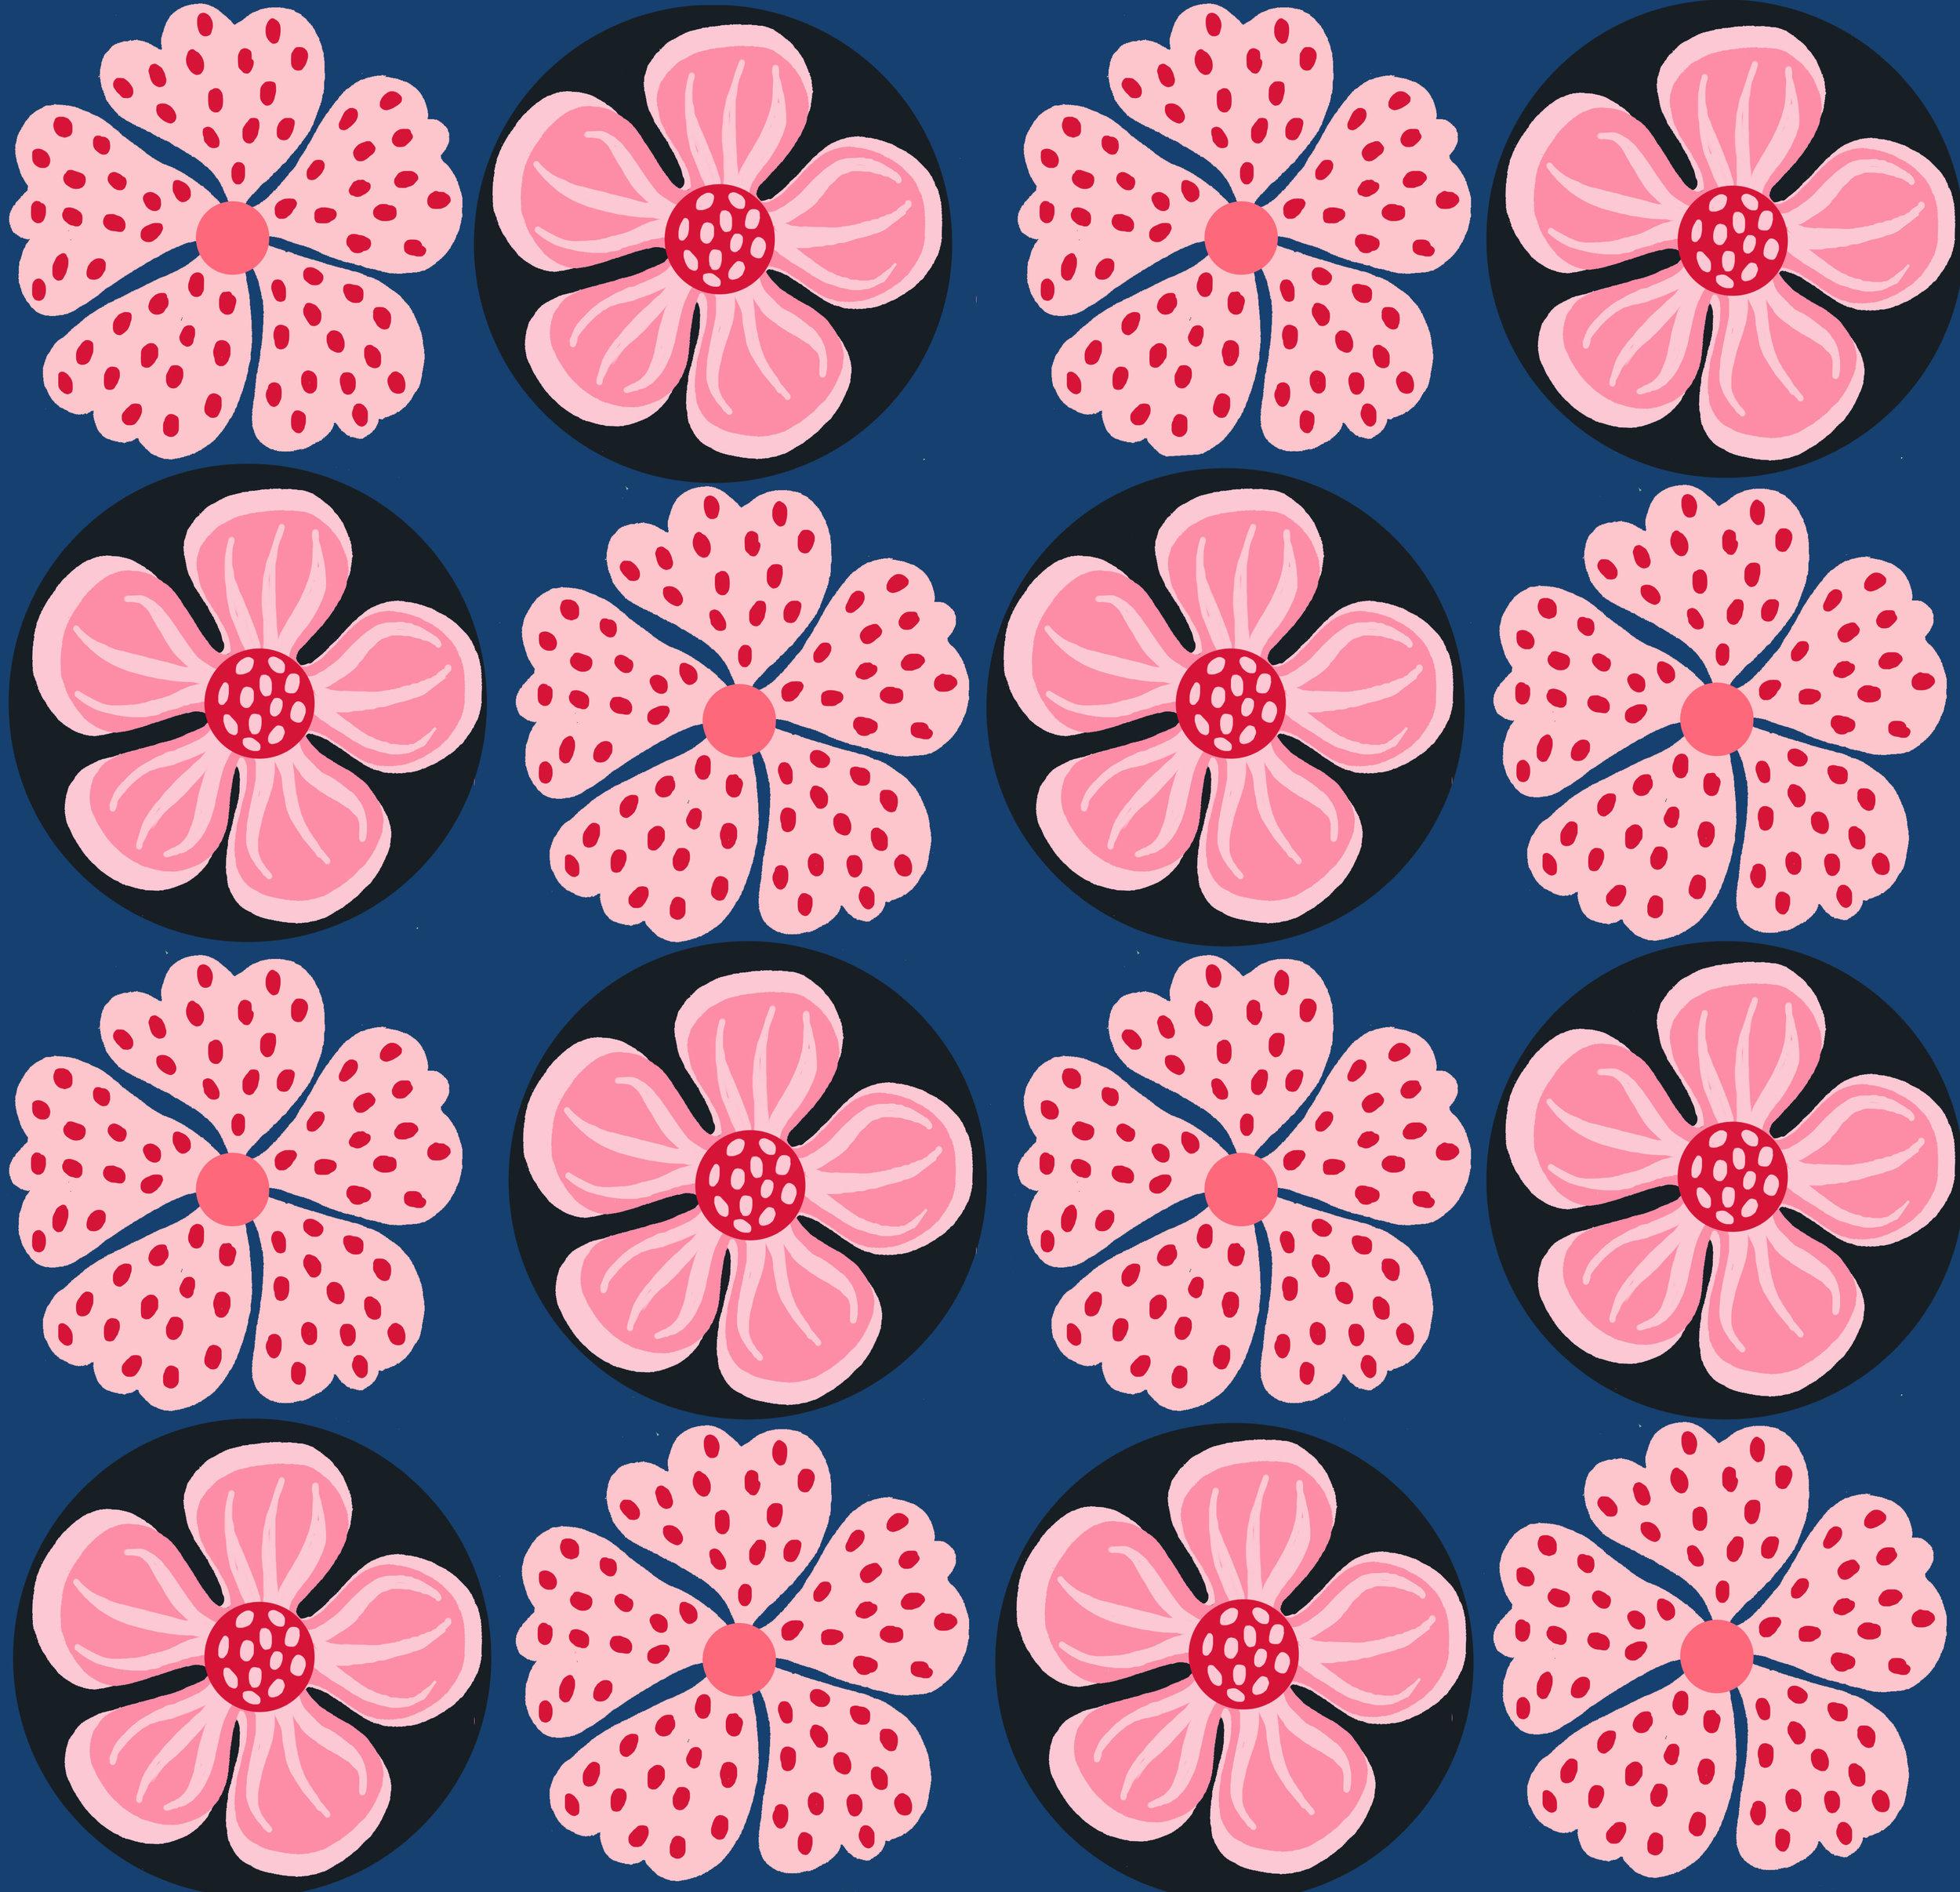 lush florl flower repeat small.jpg